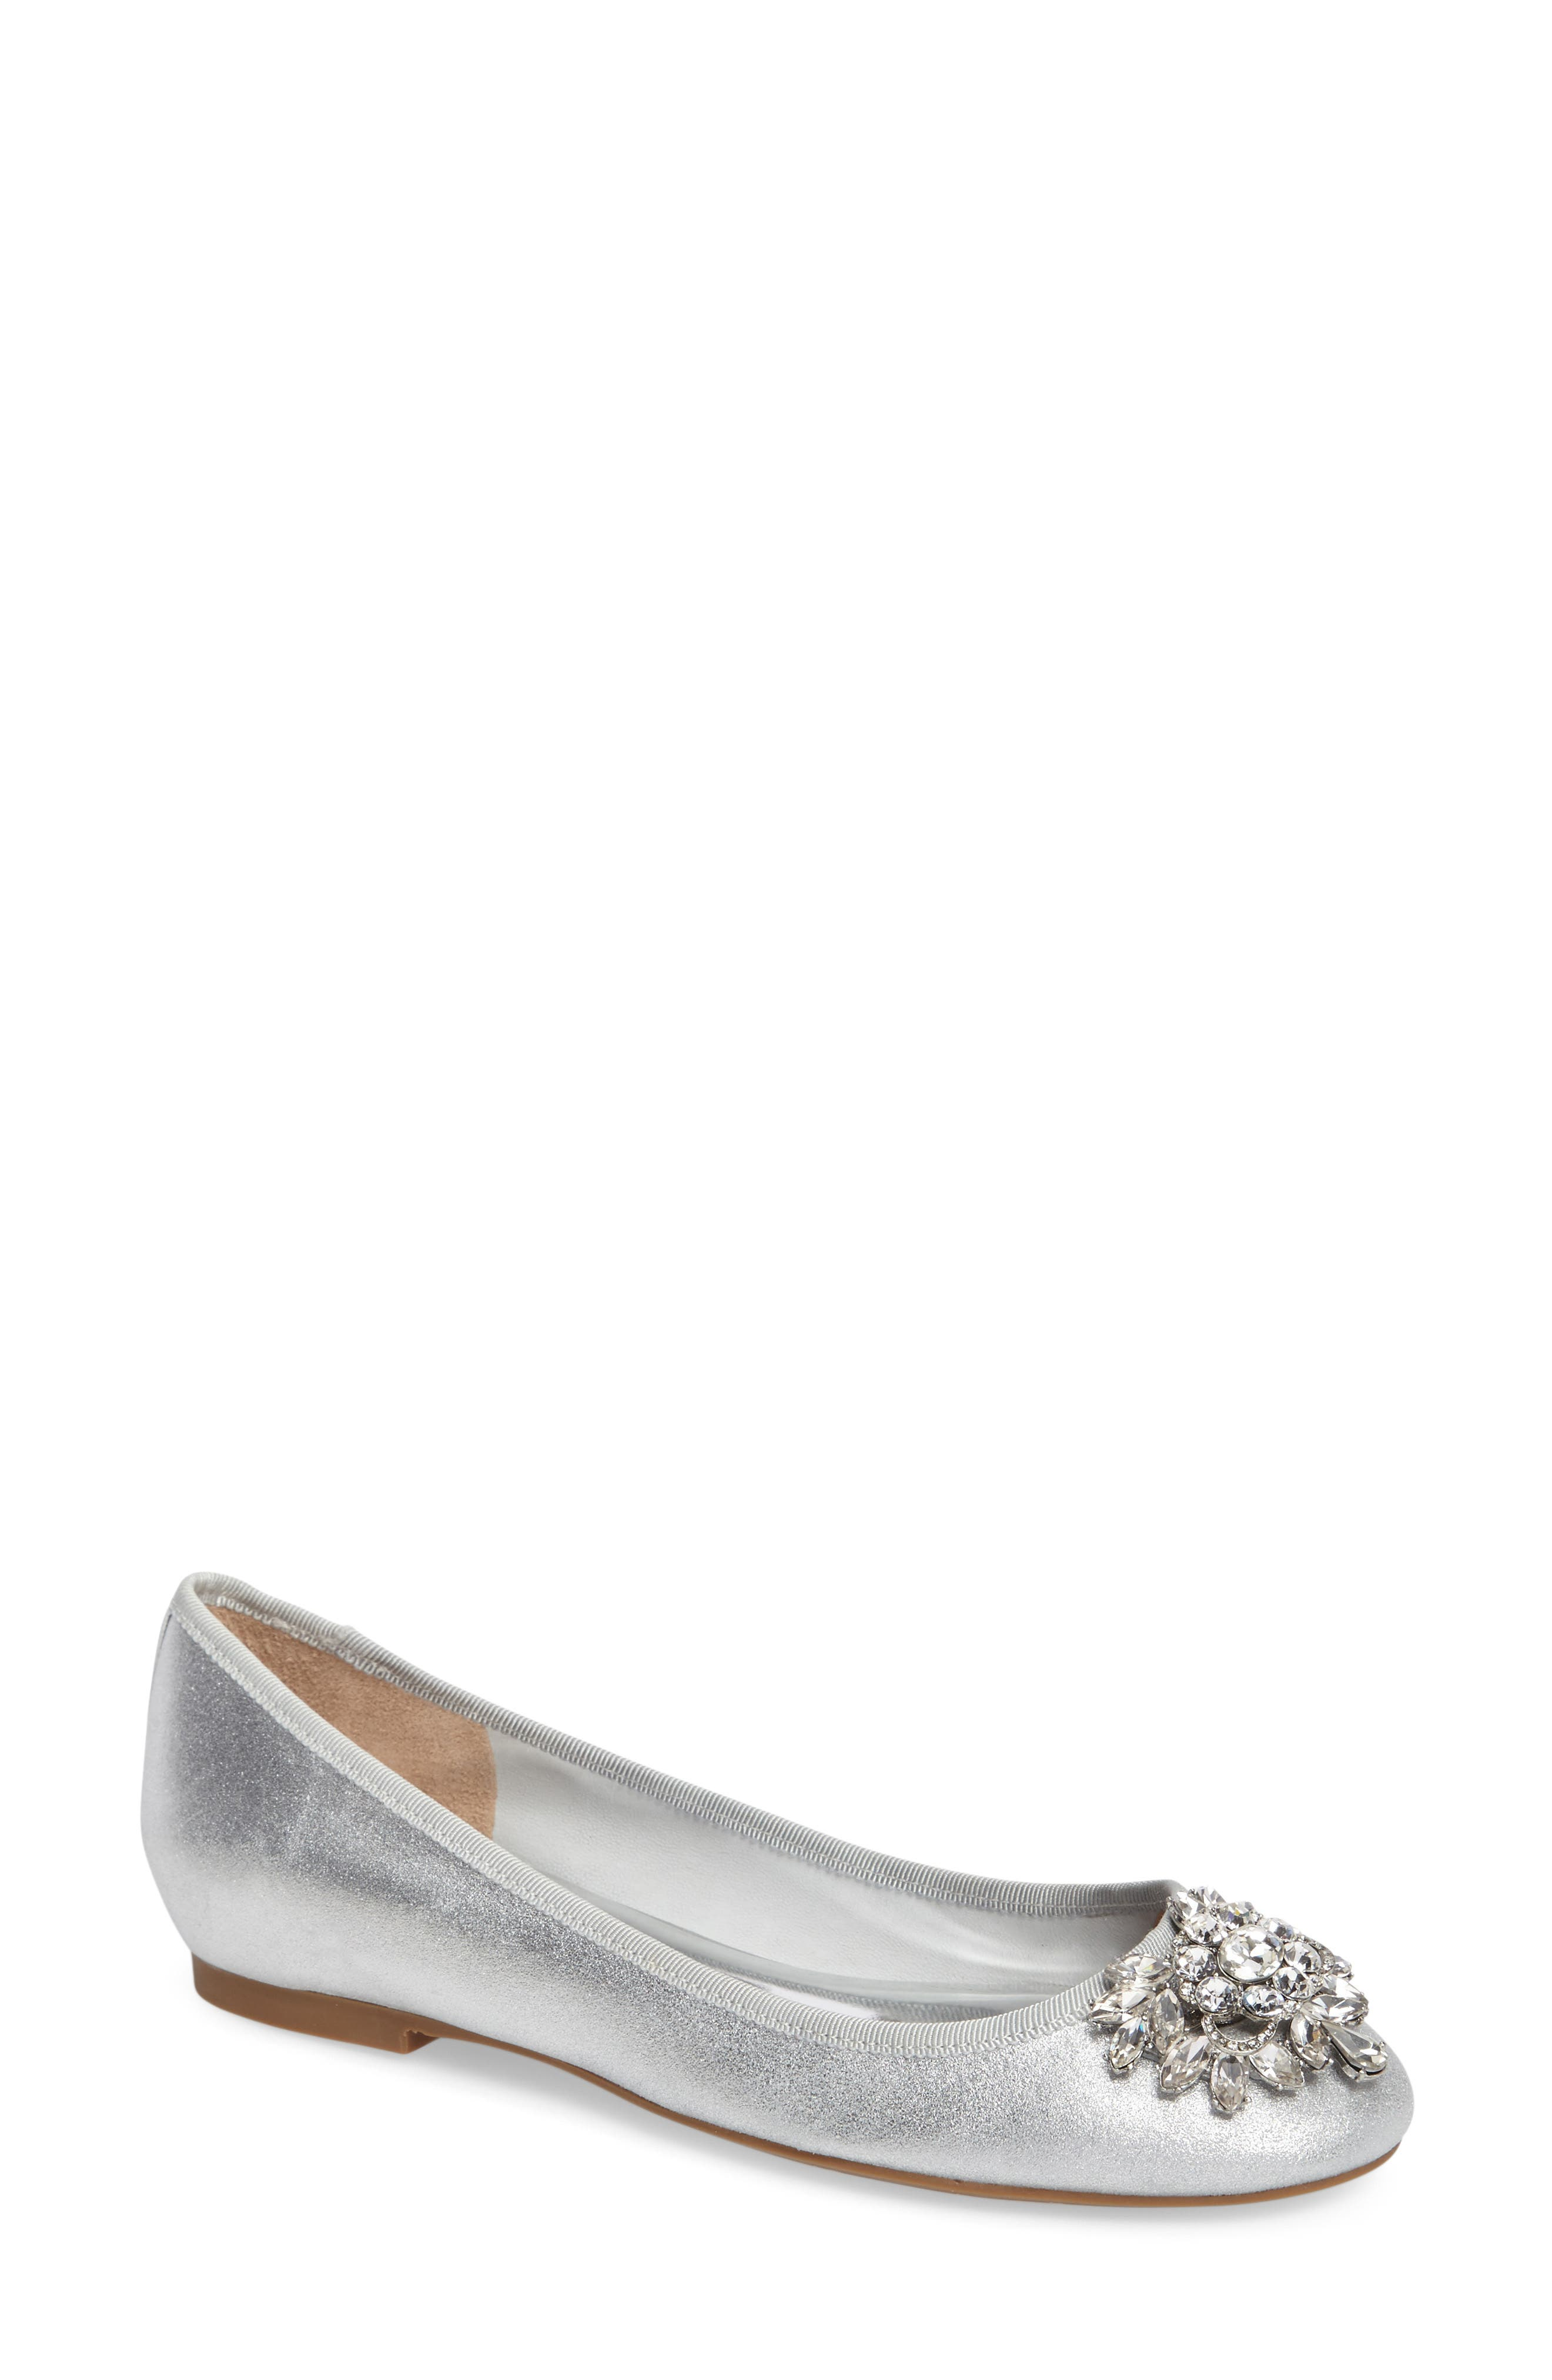 Bianca Embellished Ballet Flat,                             Main thumbnail 1, color,                             Silver Metallic Suede